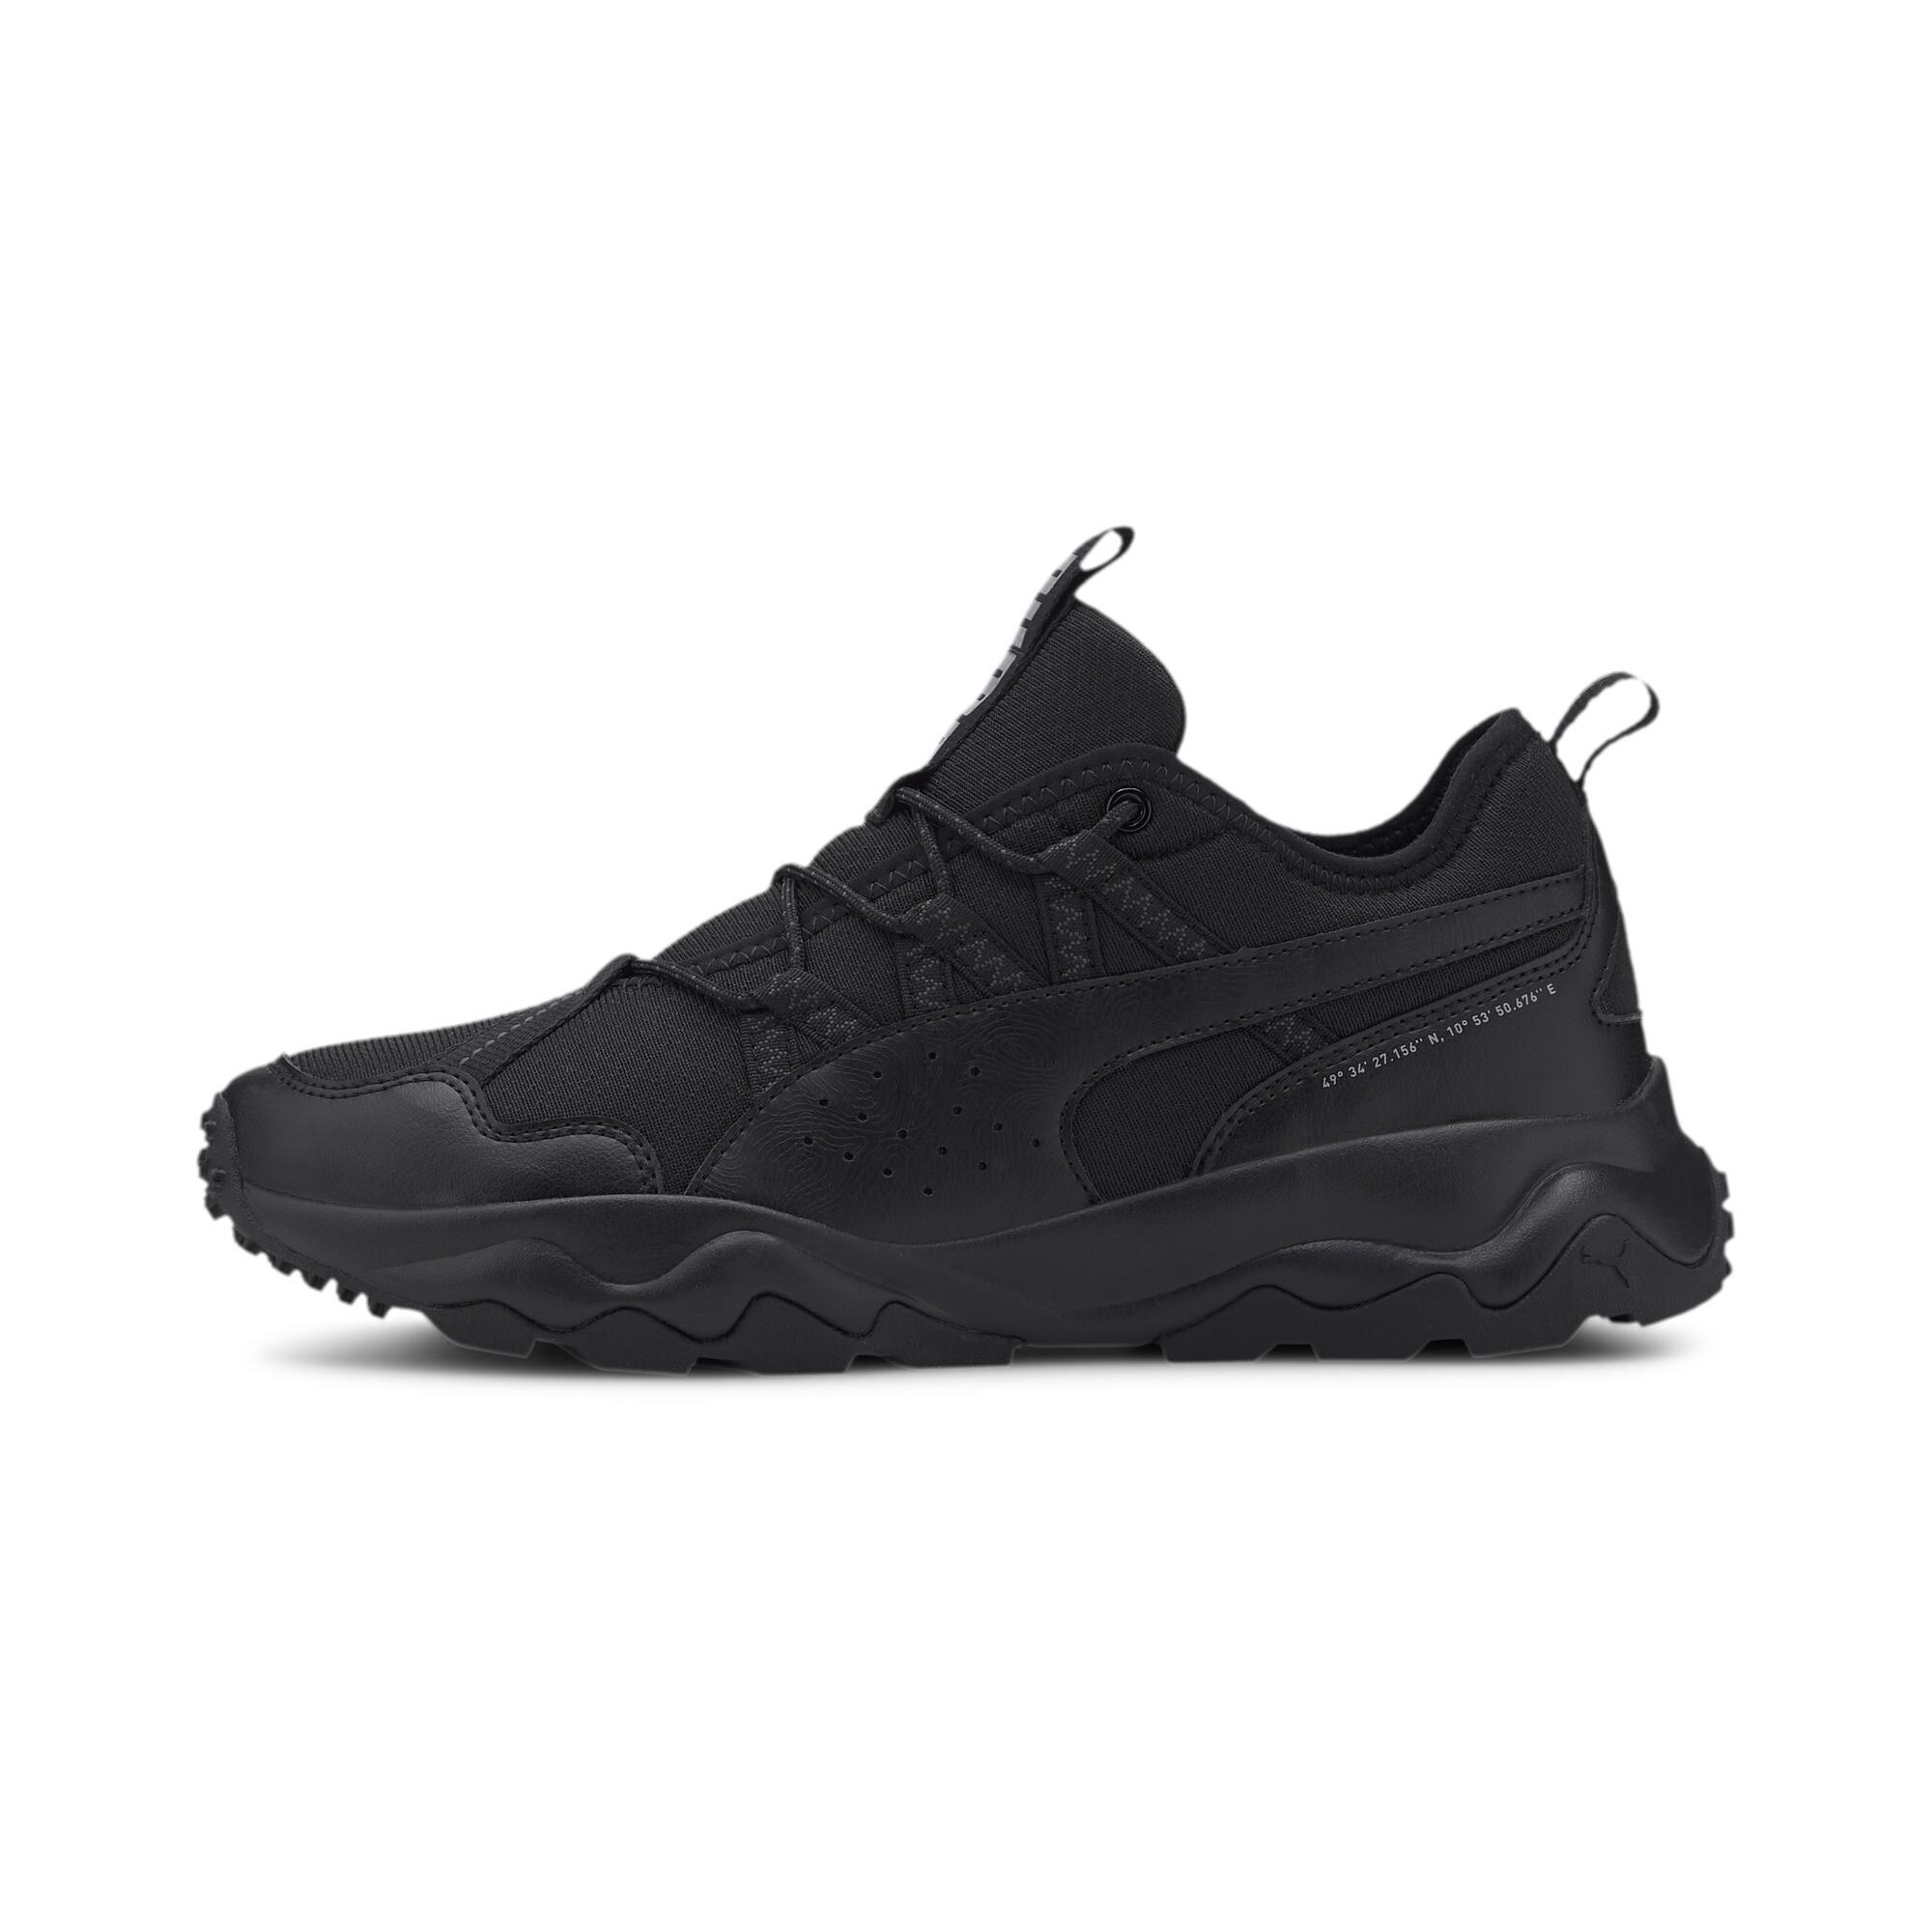 PUMA-Ember-Trail-Men-s-Running-Shoes-Men-Shoe-Running thumbnail 8